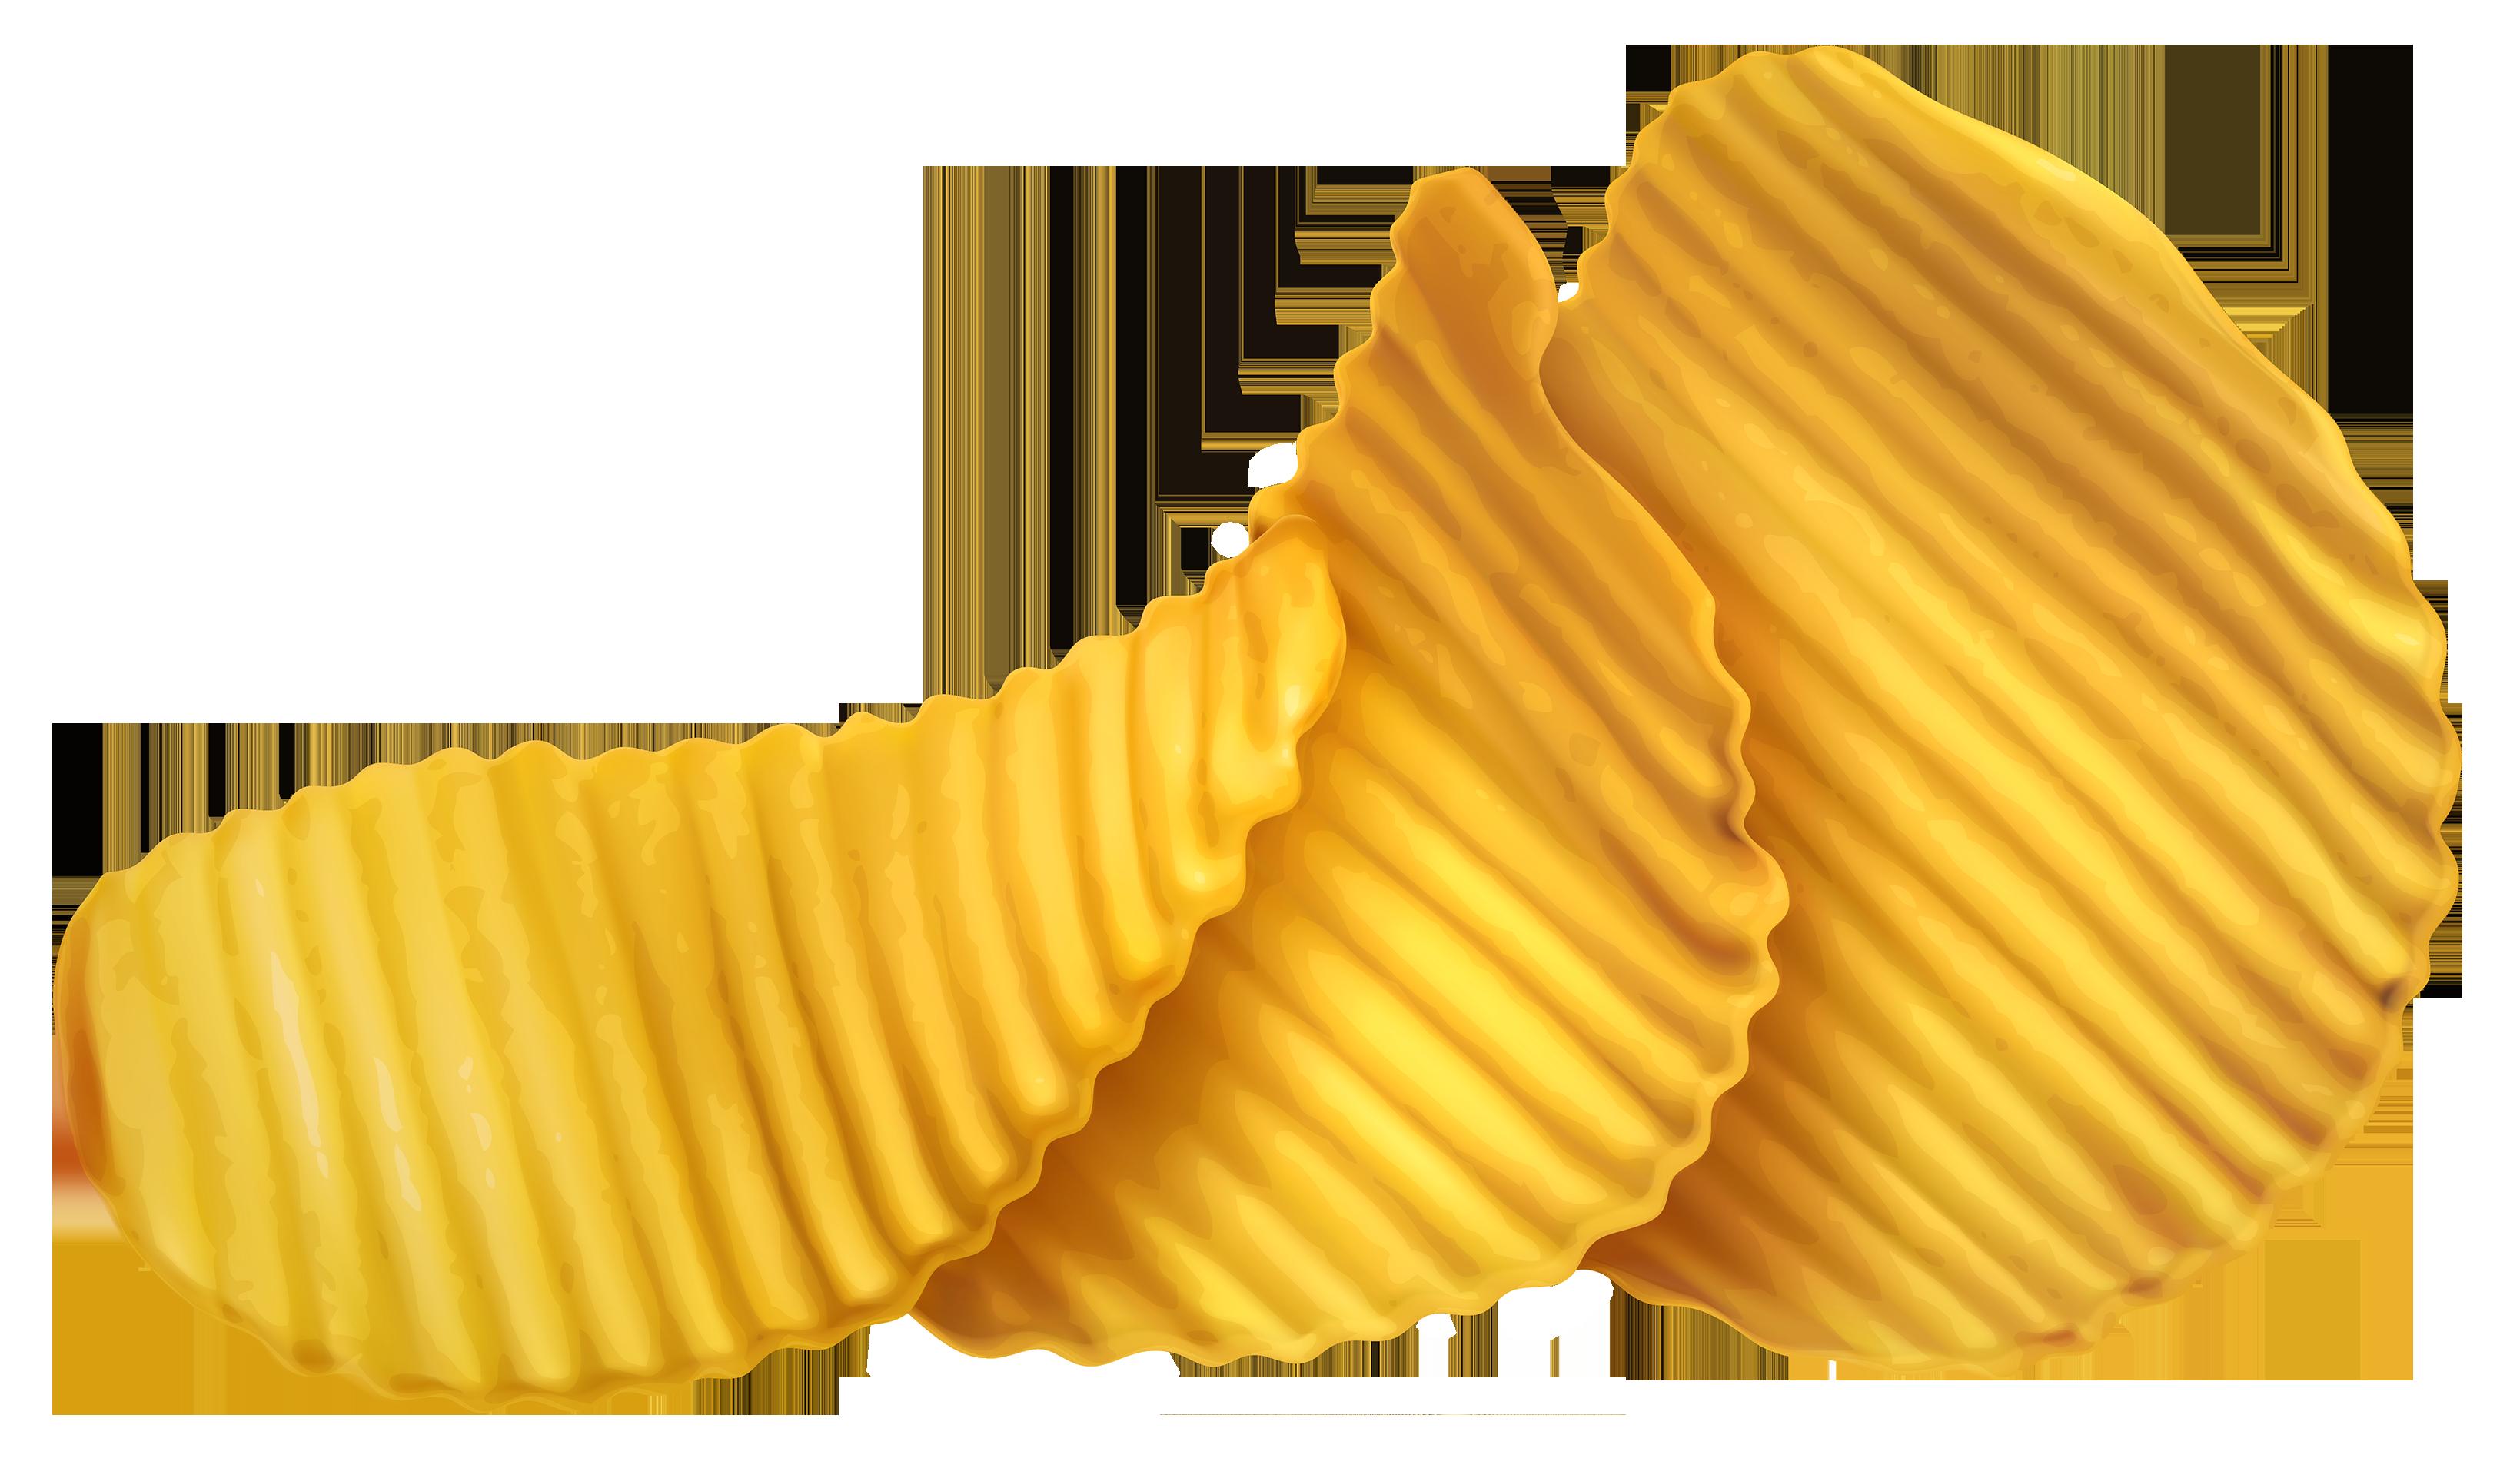 Juice clipart chip. Potato chips png vector